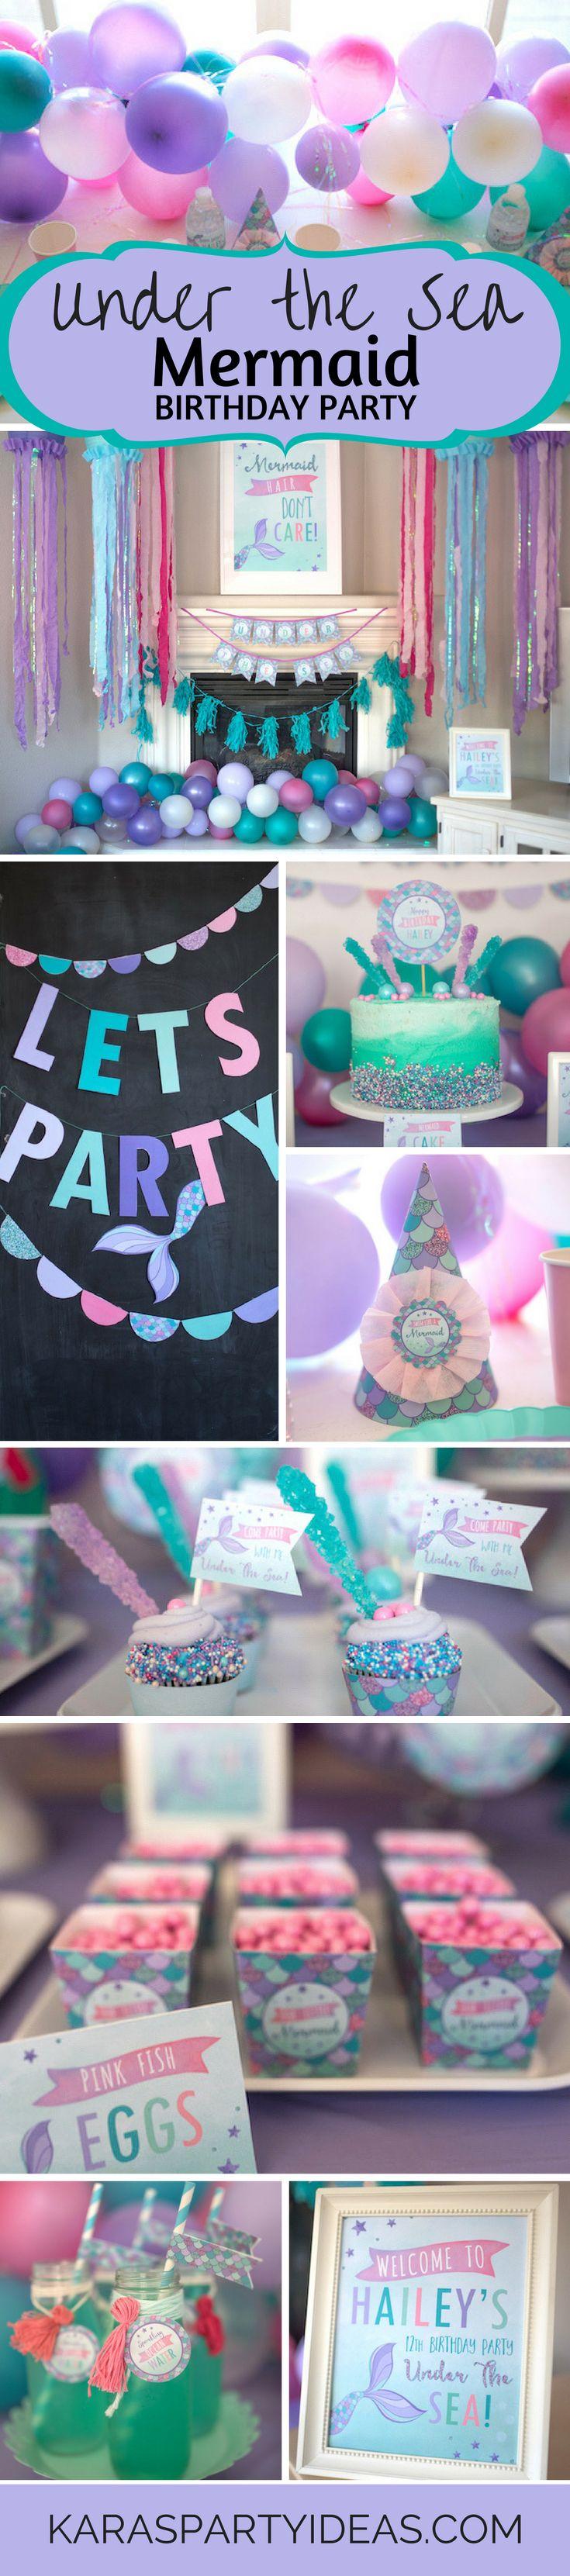 Under the Sea Mermaid Birthday Party